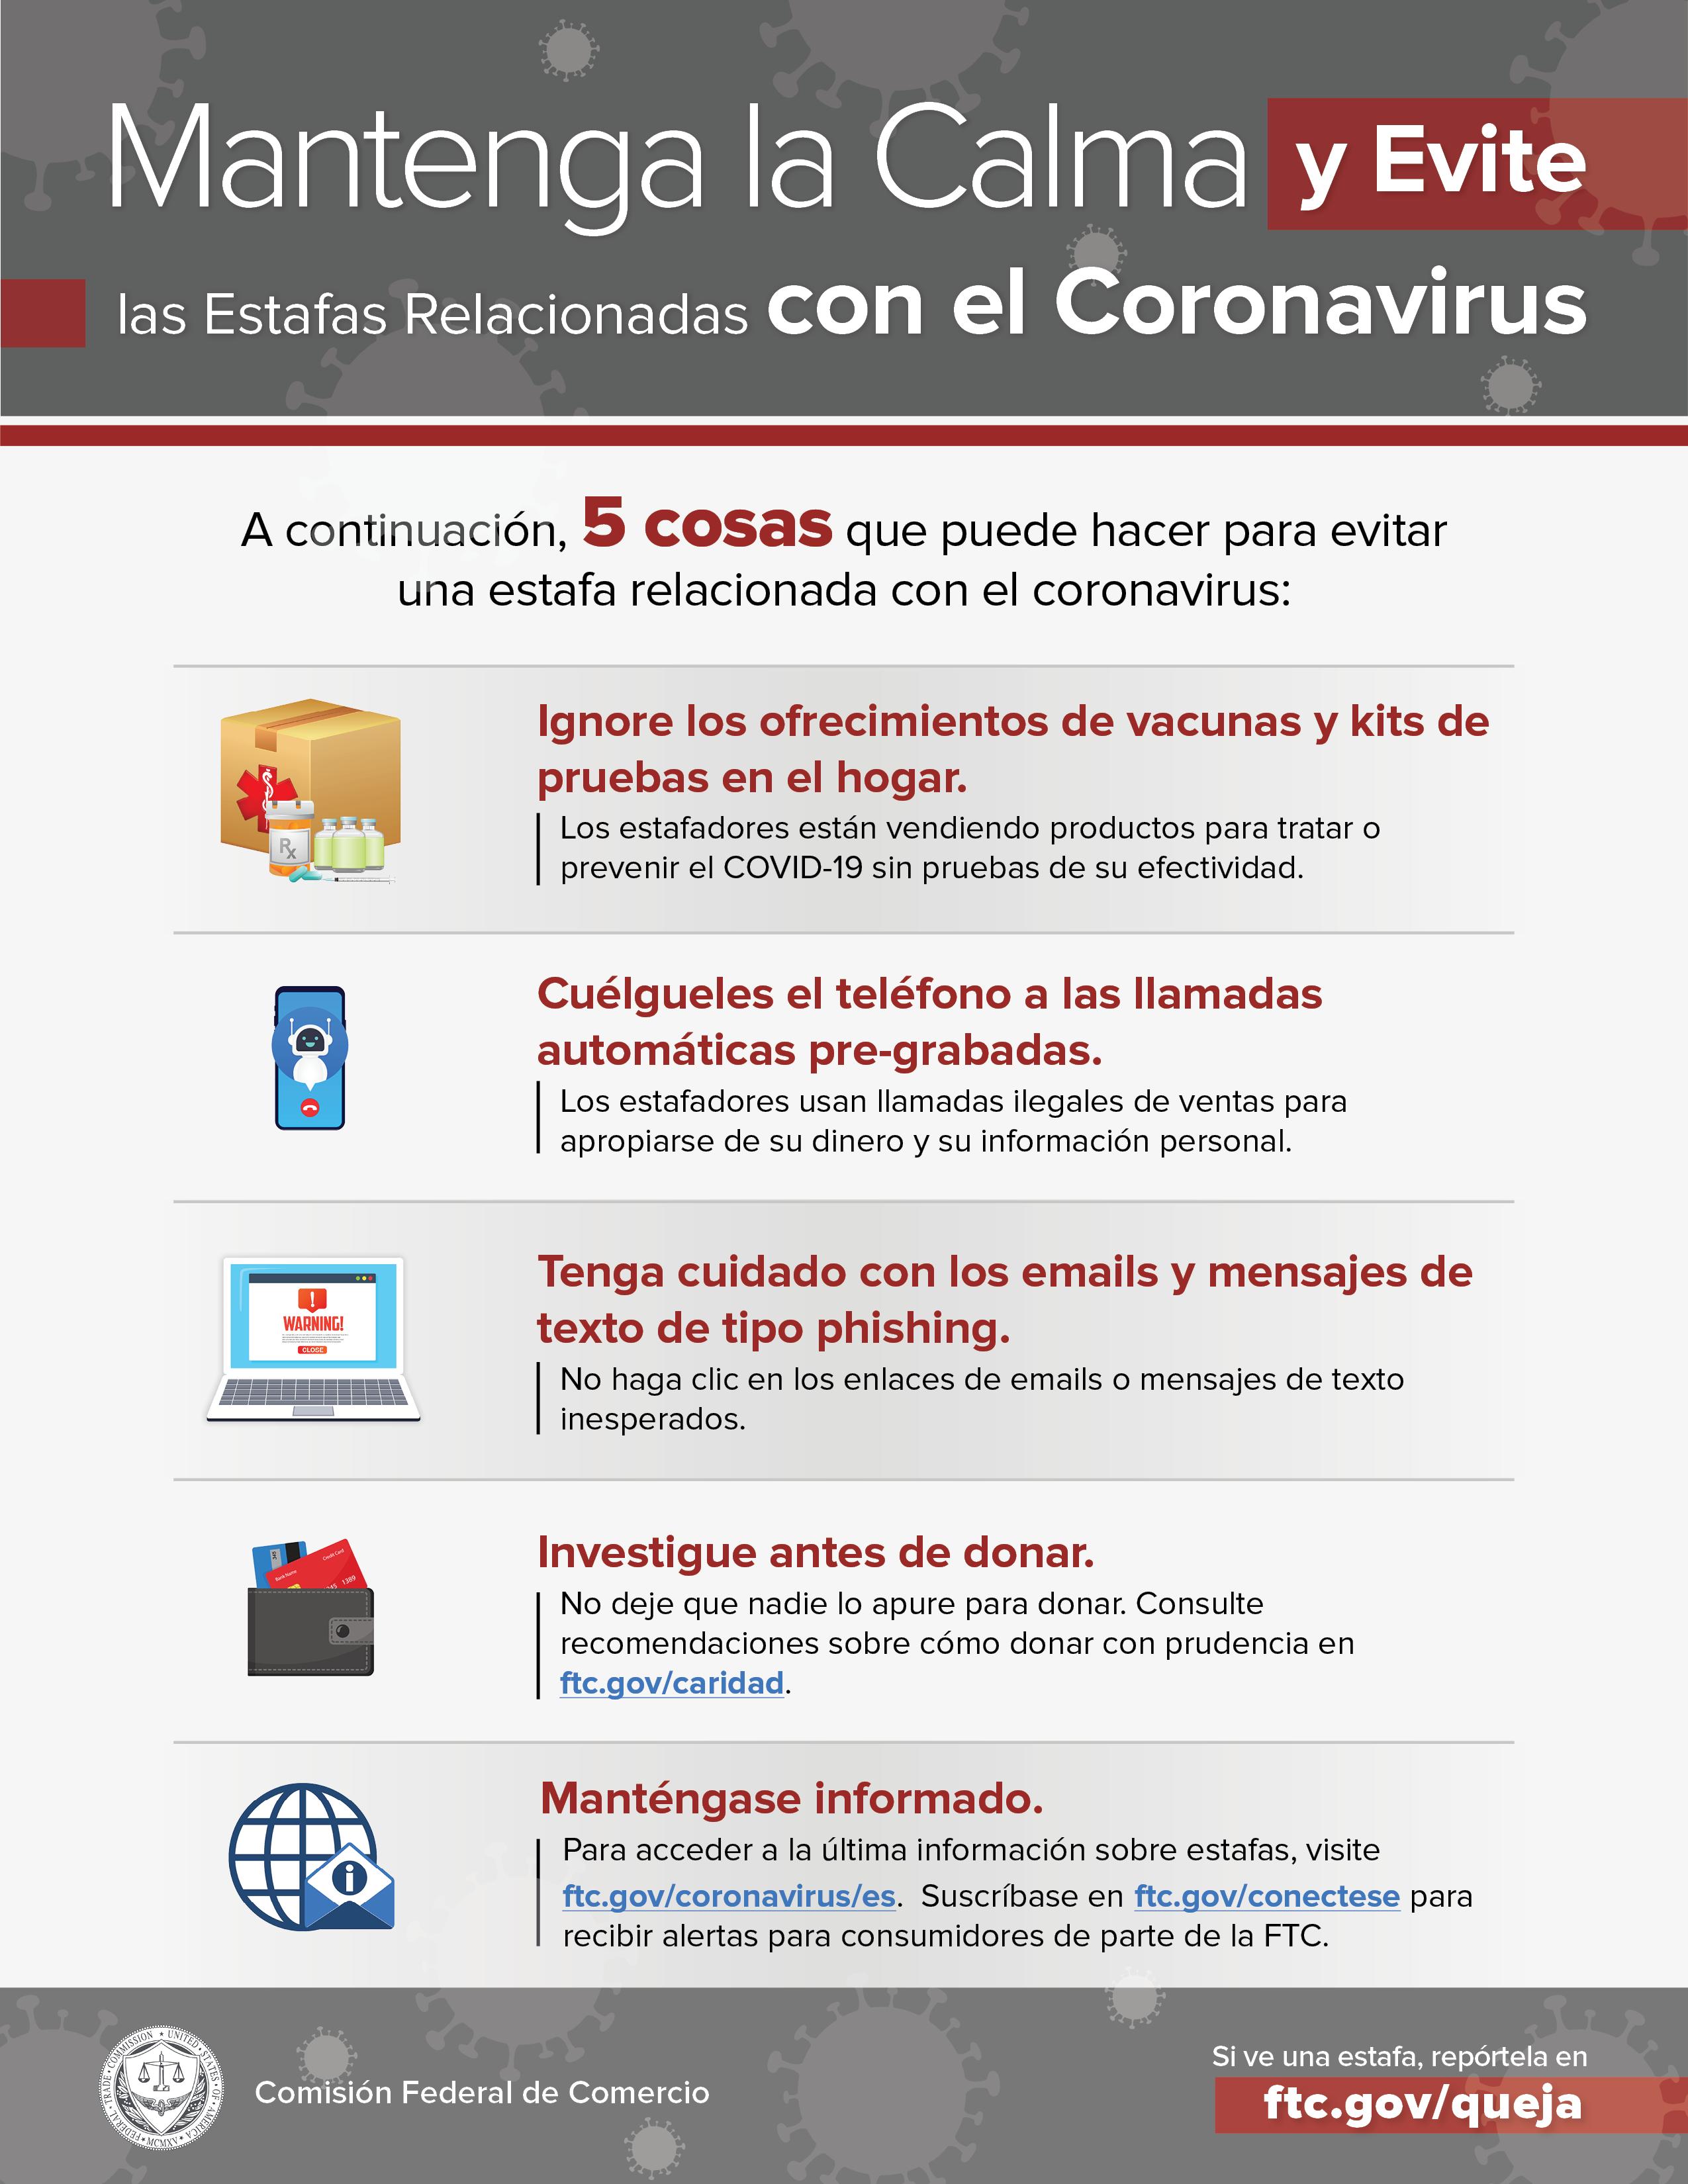 Keep Calm and Avoid Coronavirus Scams inforgraphic thumbnail.